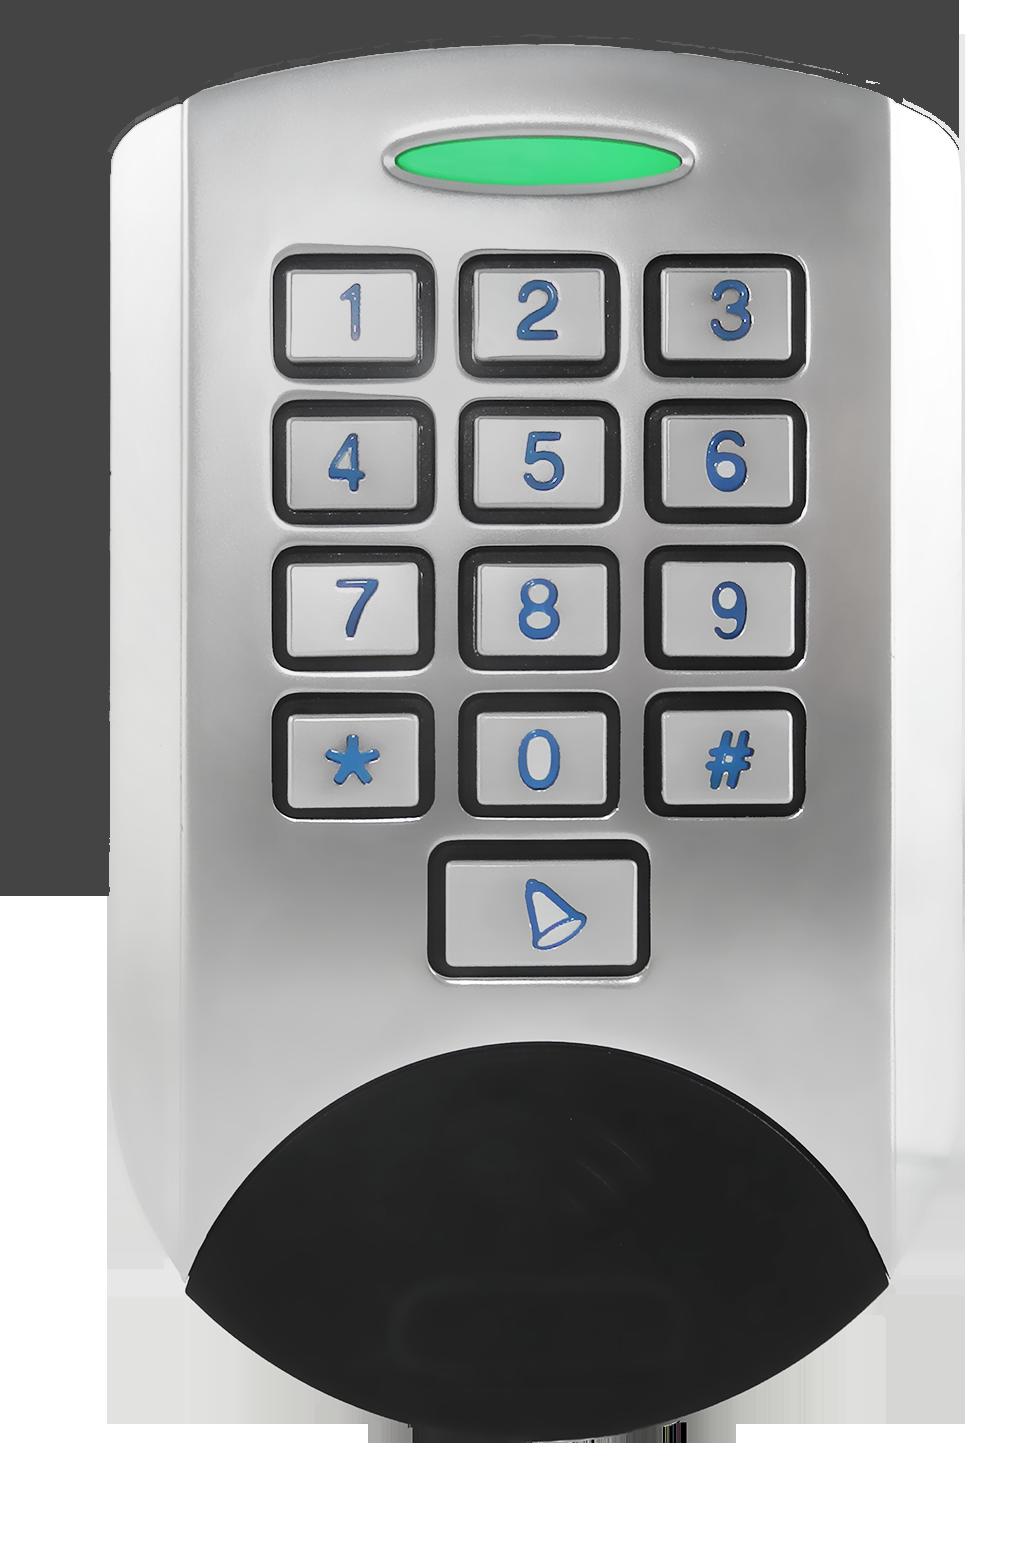 Popp Z-Wave Keypad